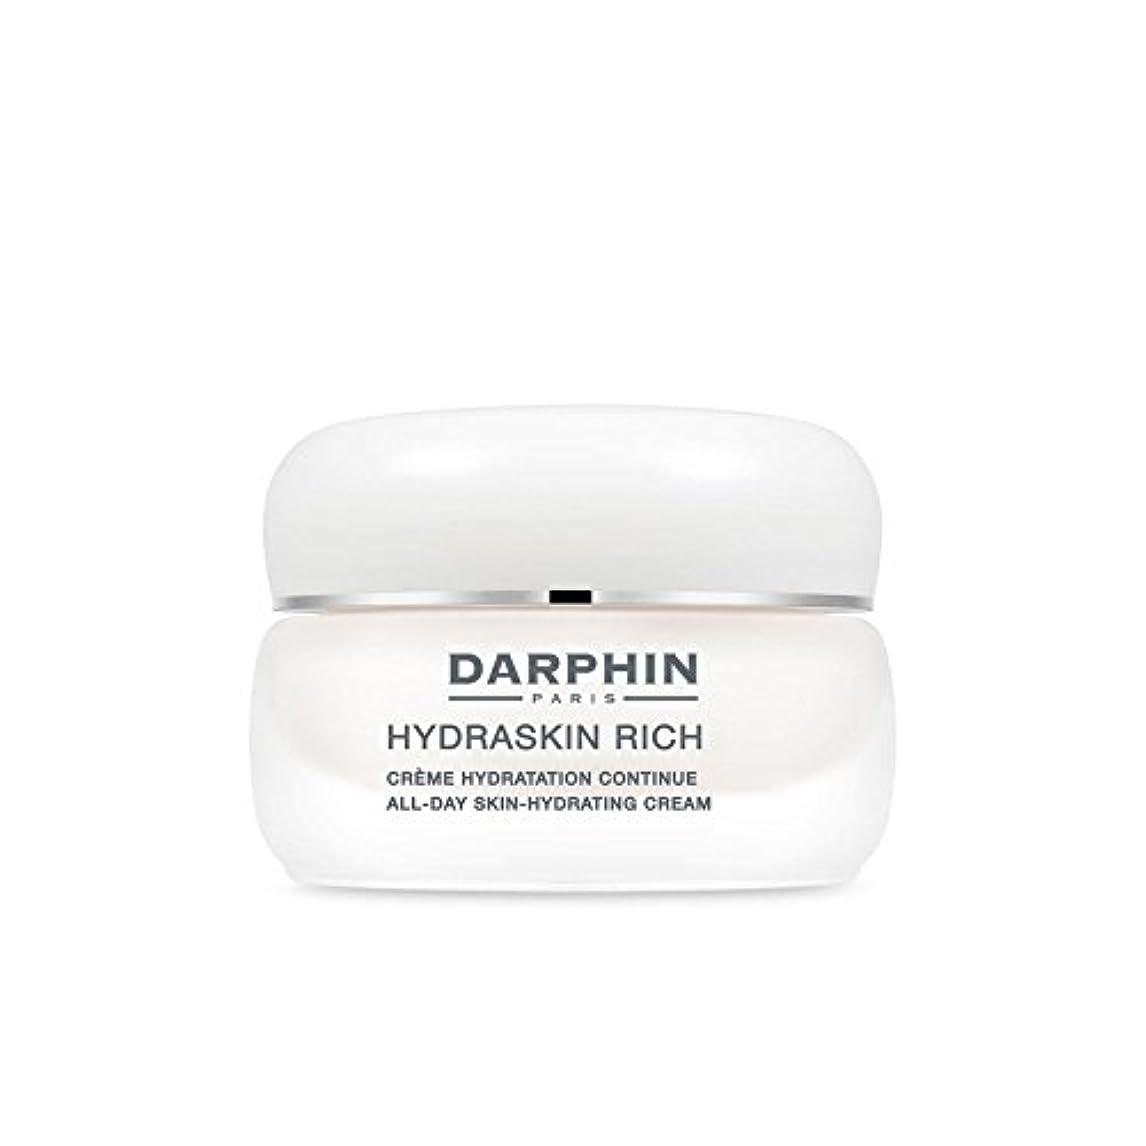 Darphin Hydraskin Rich -Protective Moisturising Cream (50ml) - 豊富 - 保護保湿クリーム(50)にダルファン [並行輸入品]